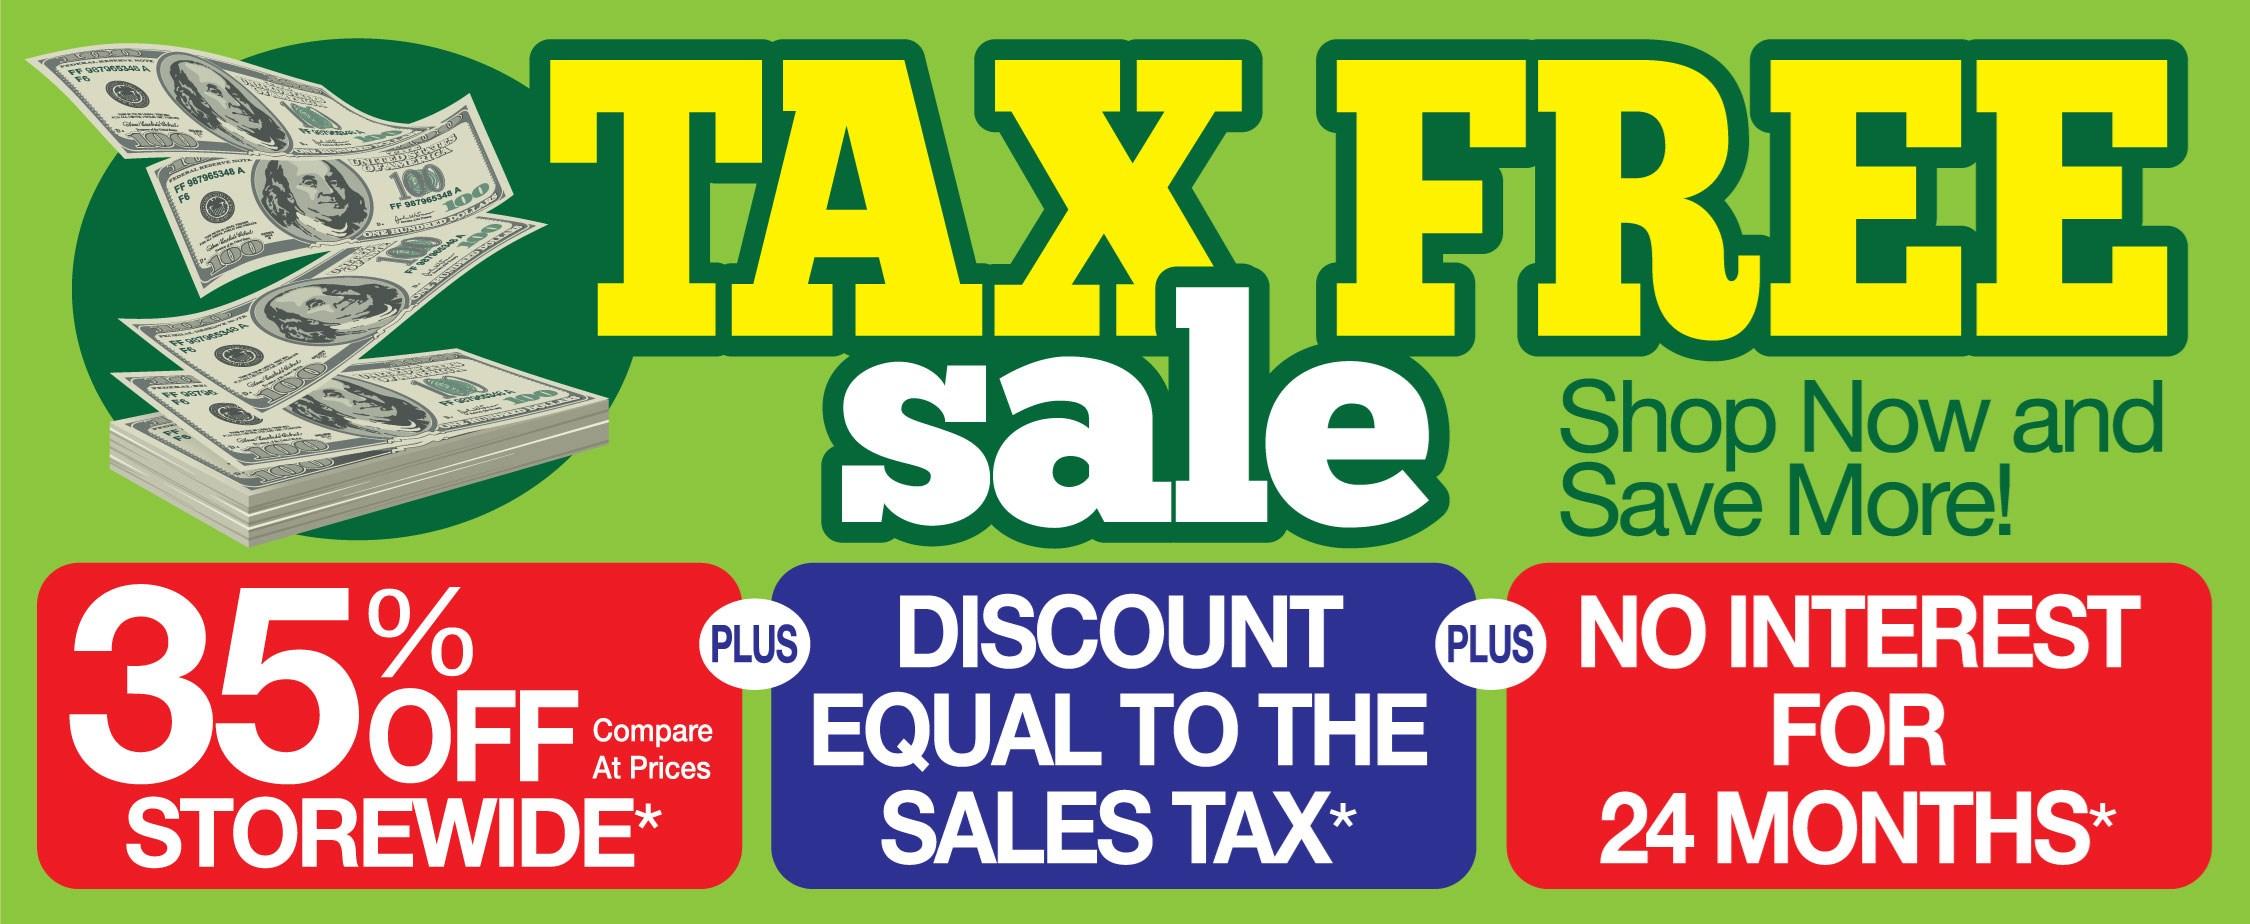 Tax Free Sale Household Furniture